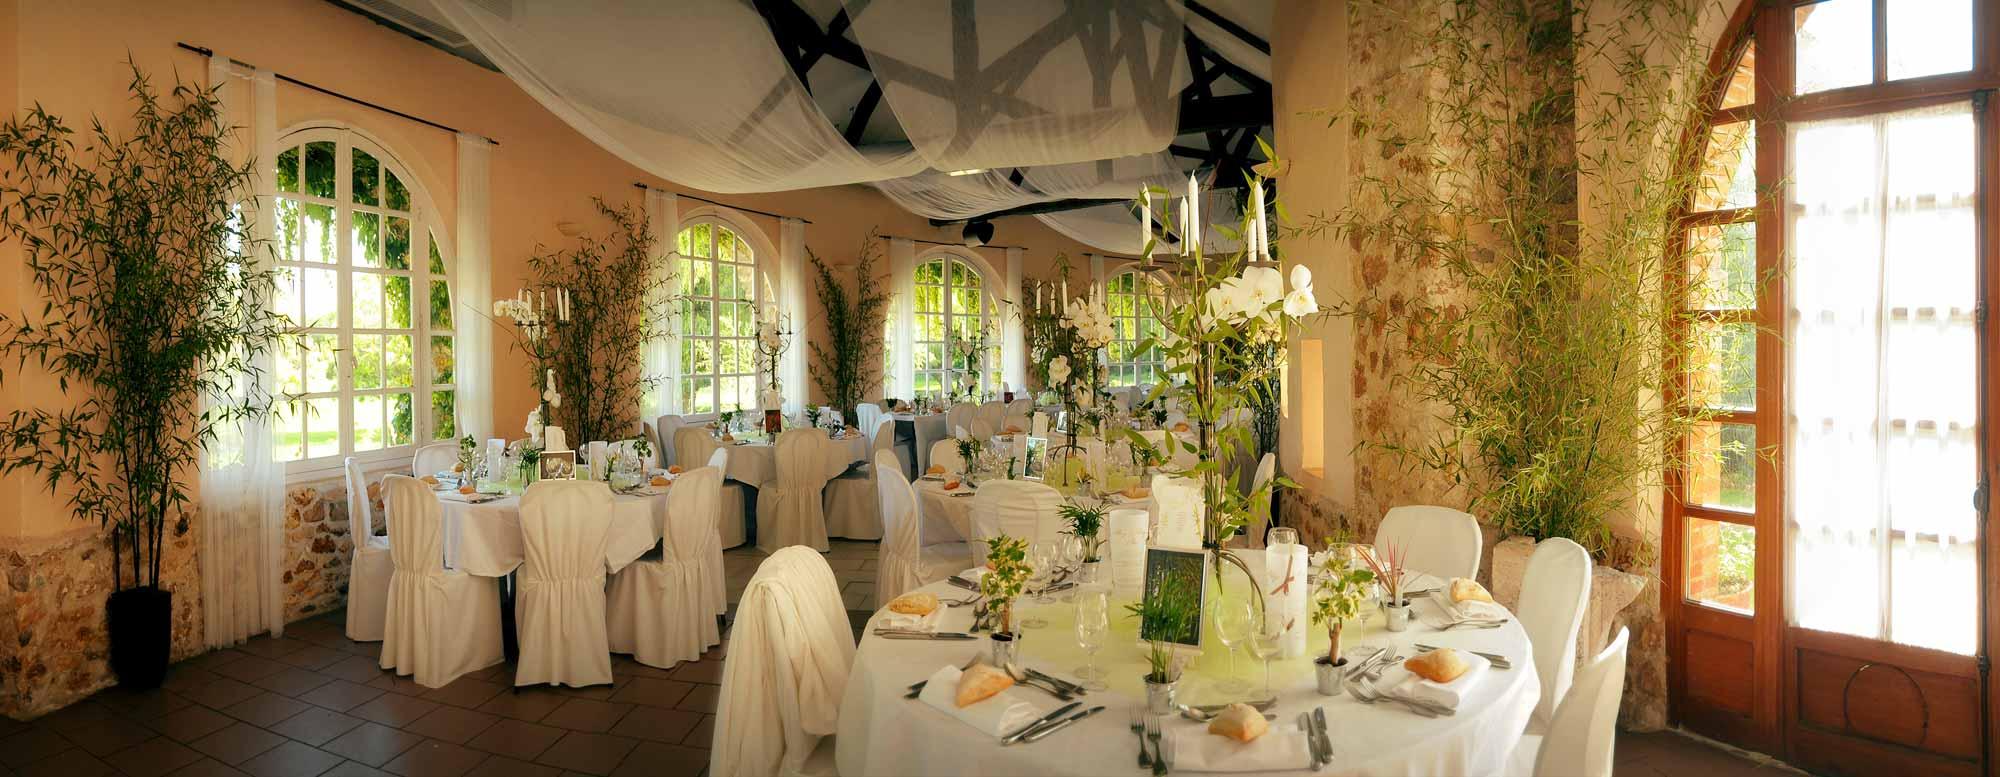 Location Salle De Reception Mariage Et Evenementiel En Seine Et